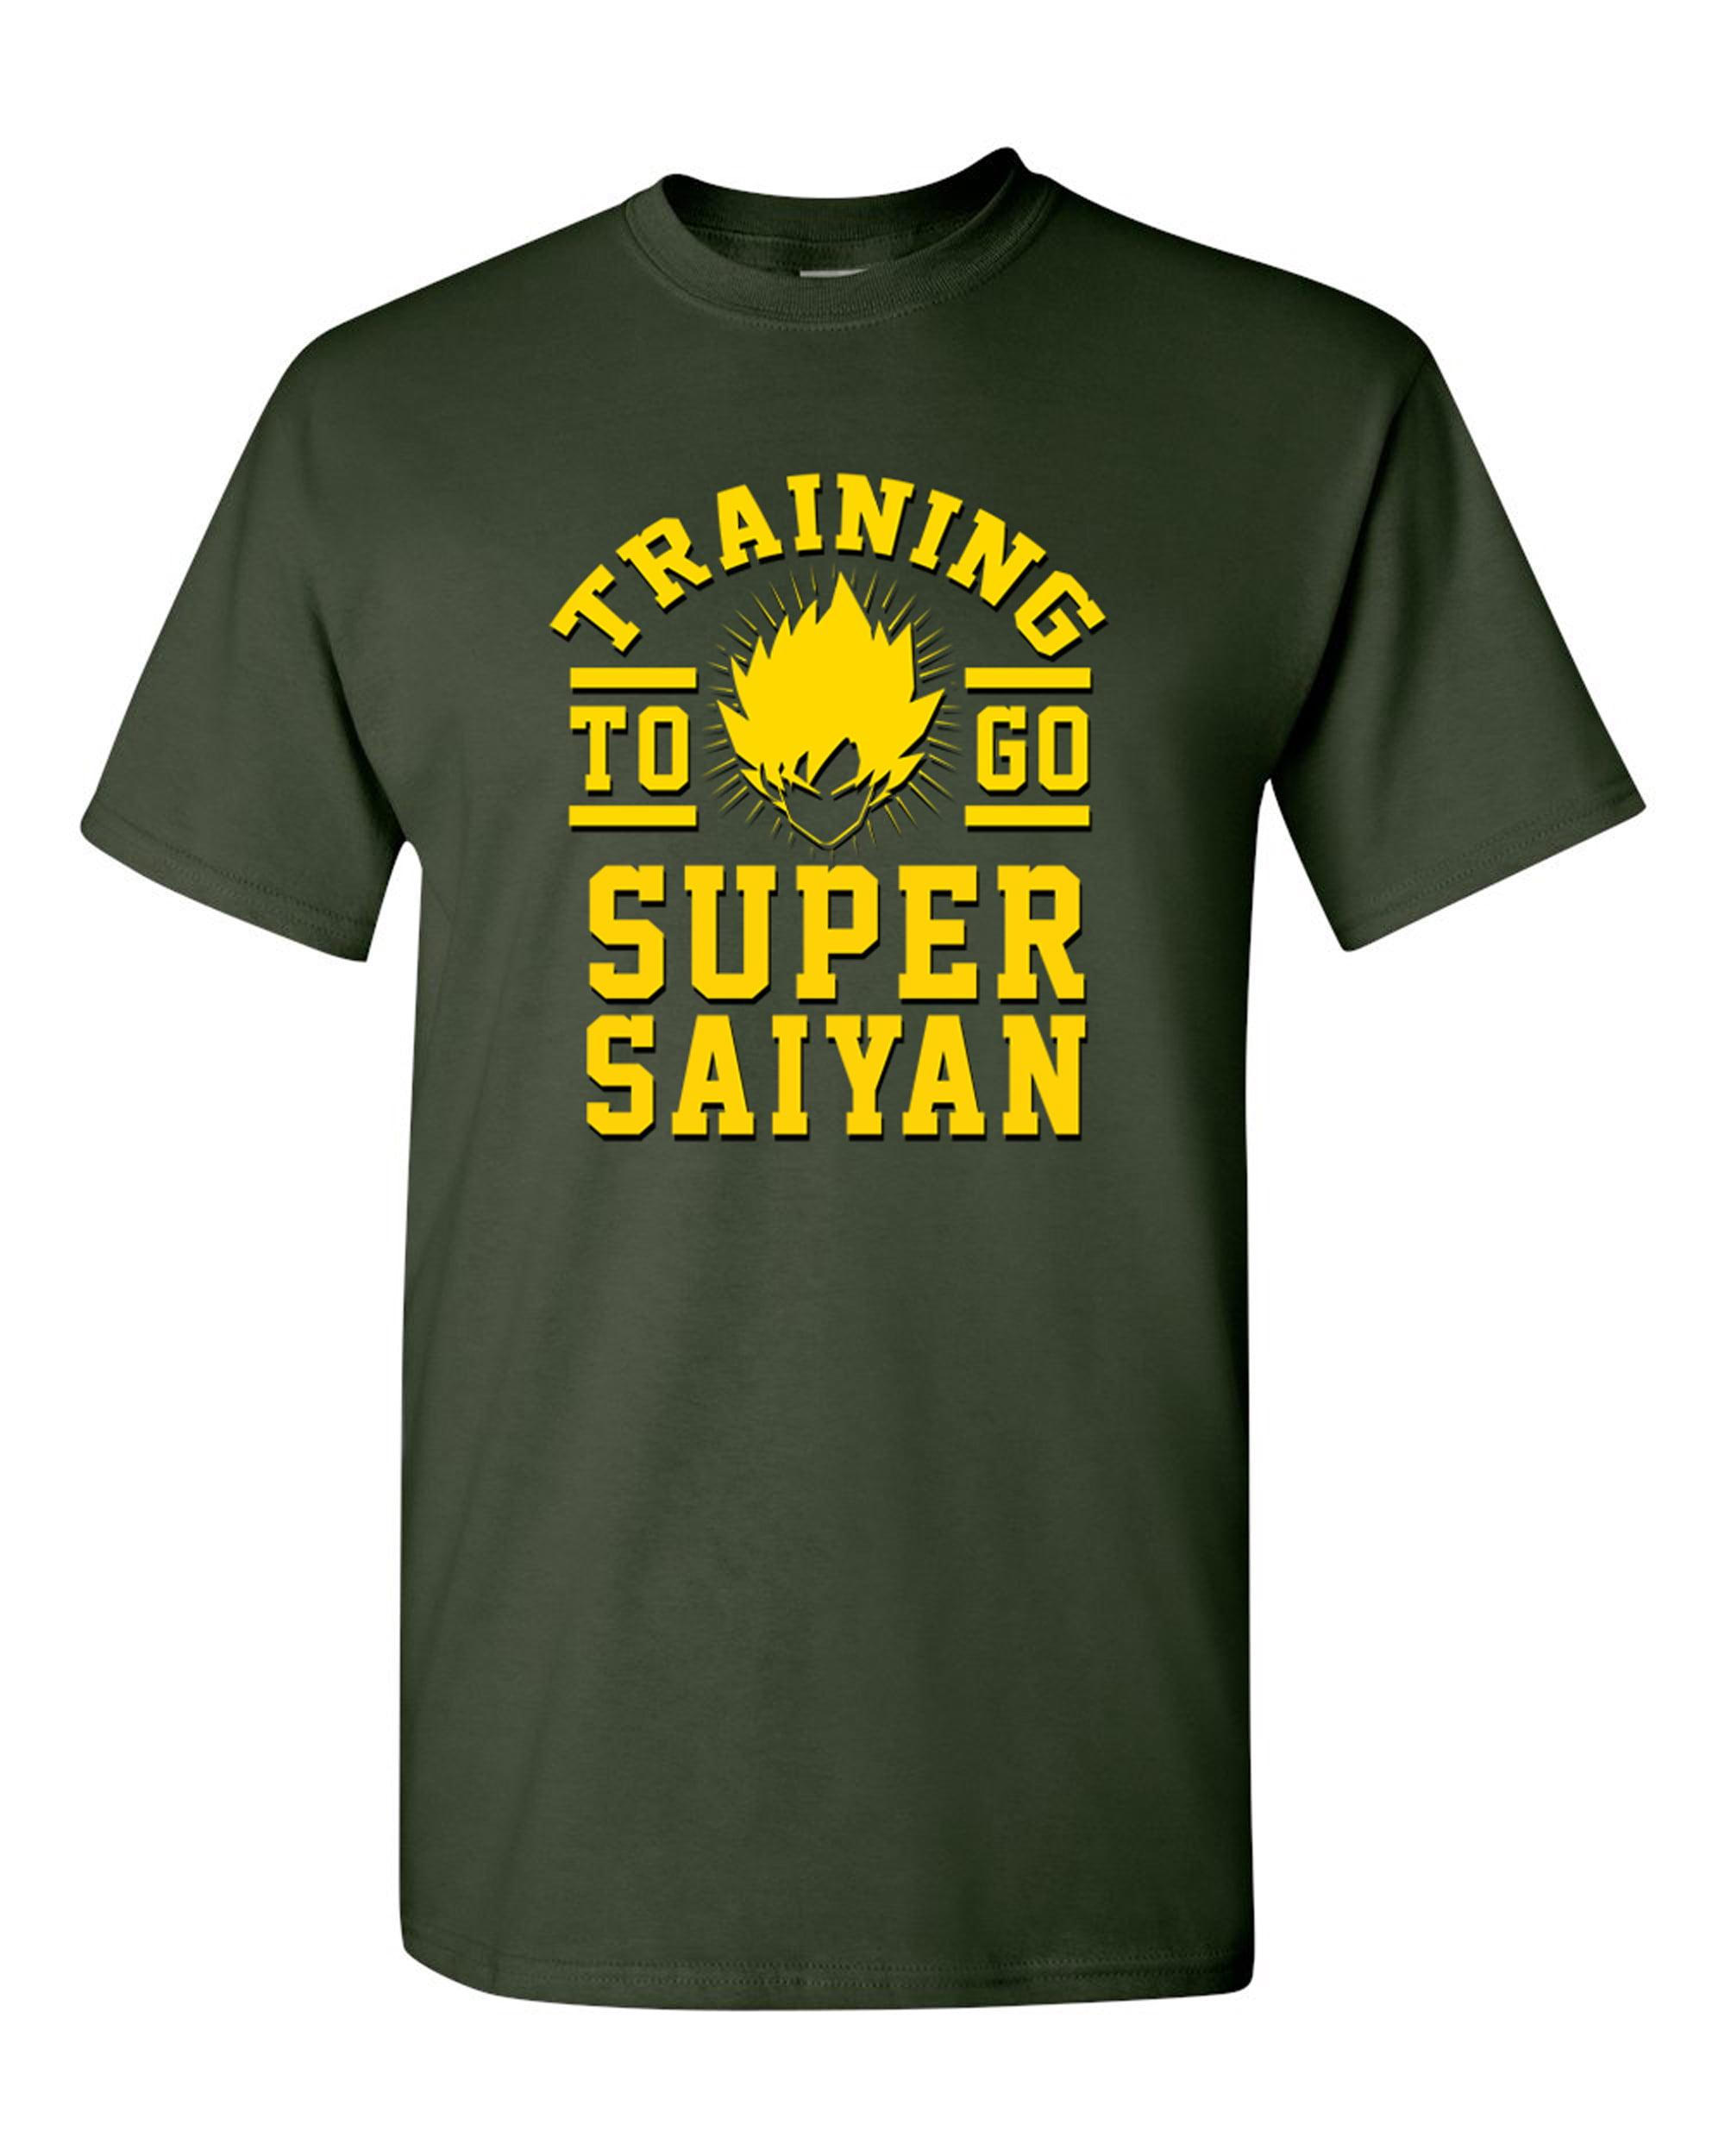 Ladies Training To Go Super Saiyan Gym Workout Anime Funny Parody DT T-Shirt Tee